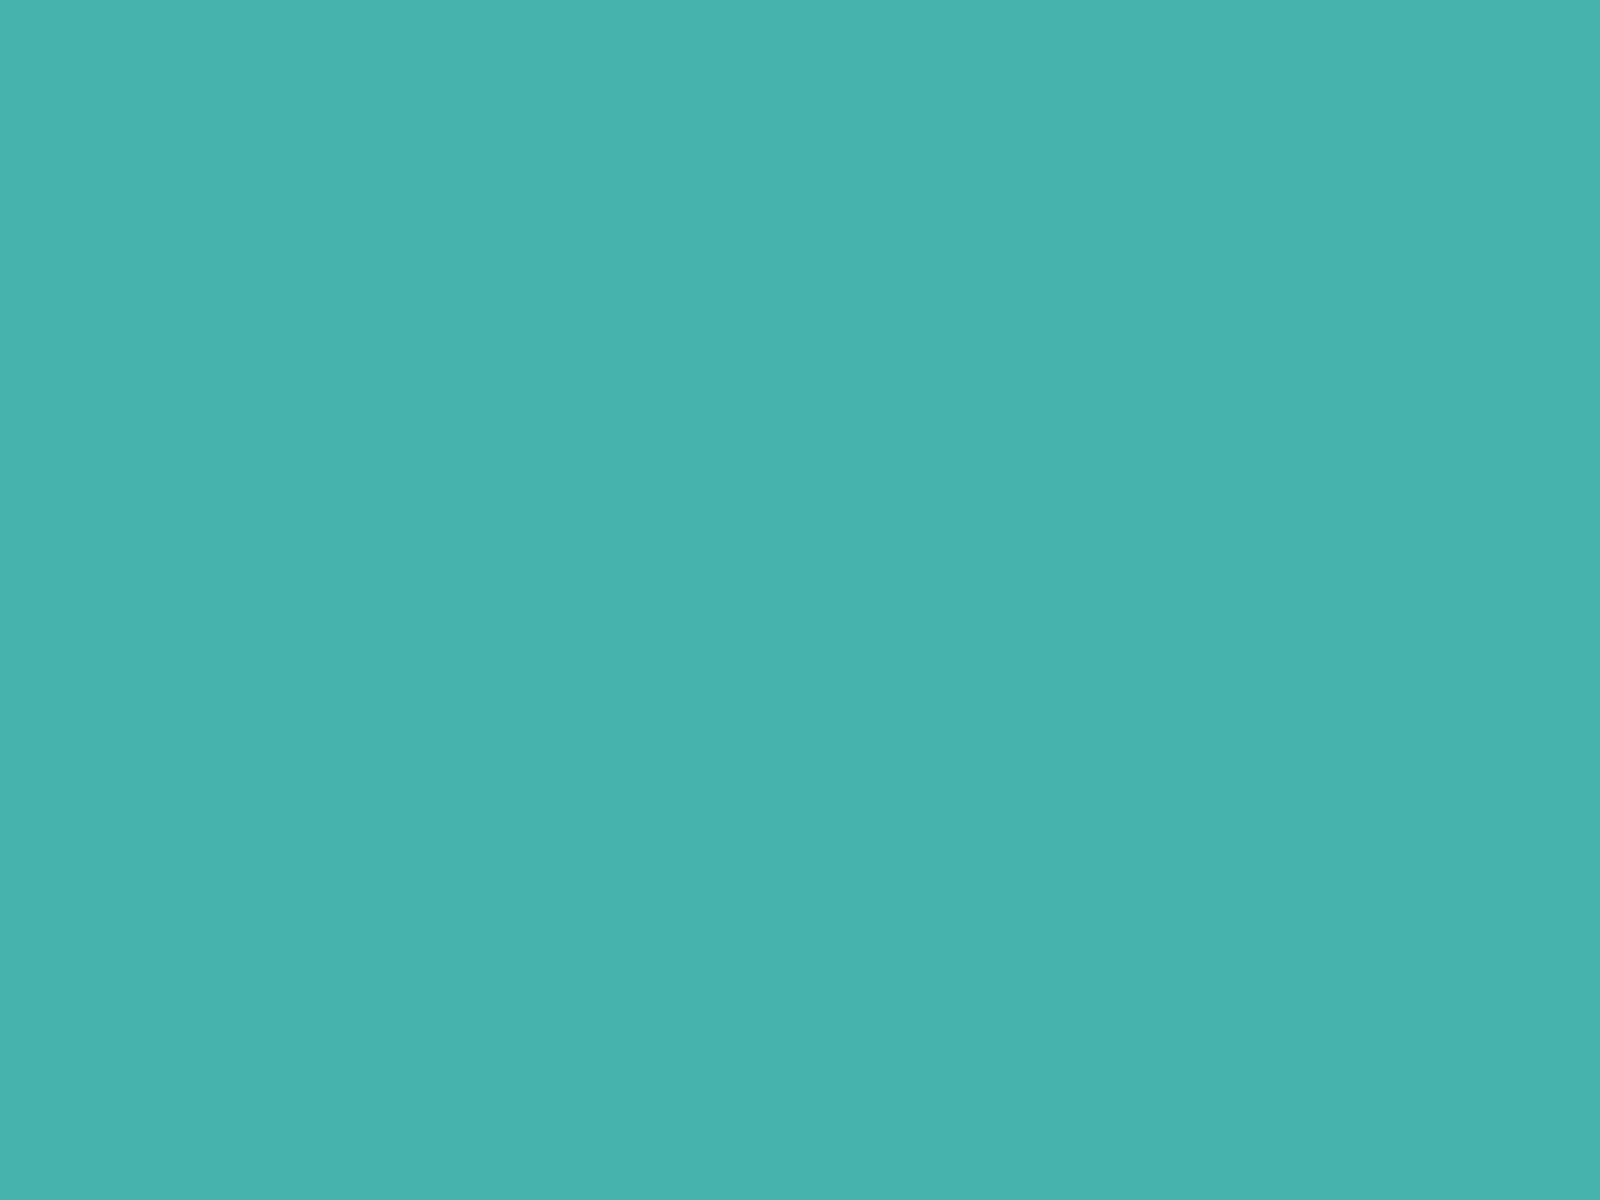 1600x1200 Verdigris Solid Color Background